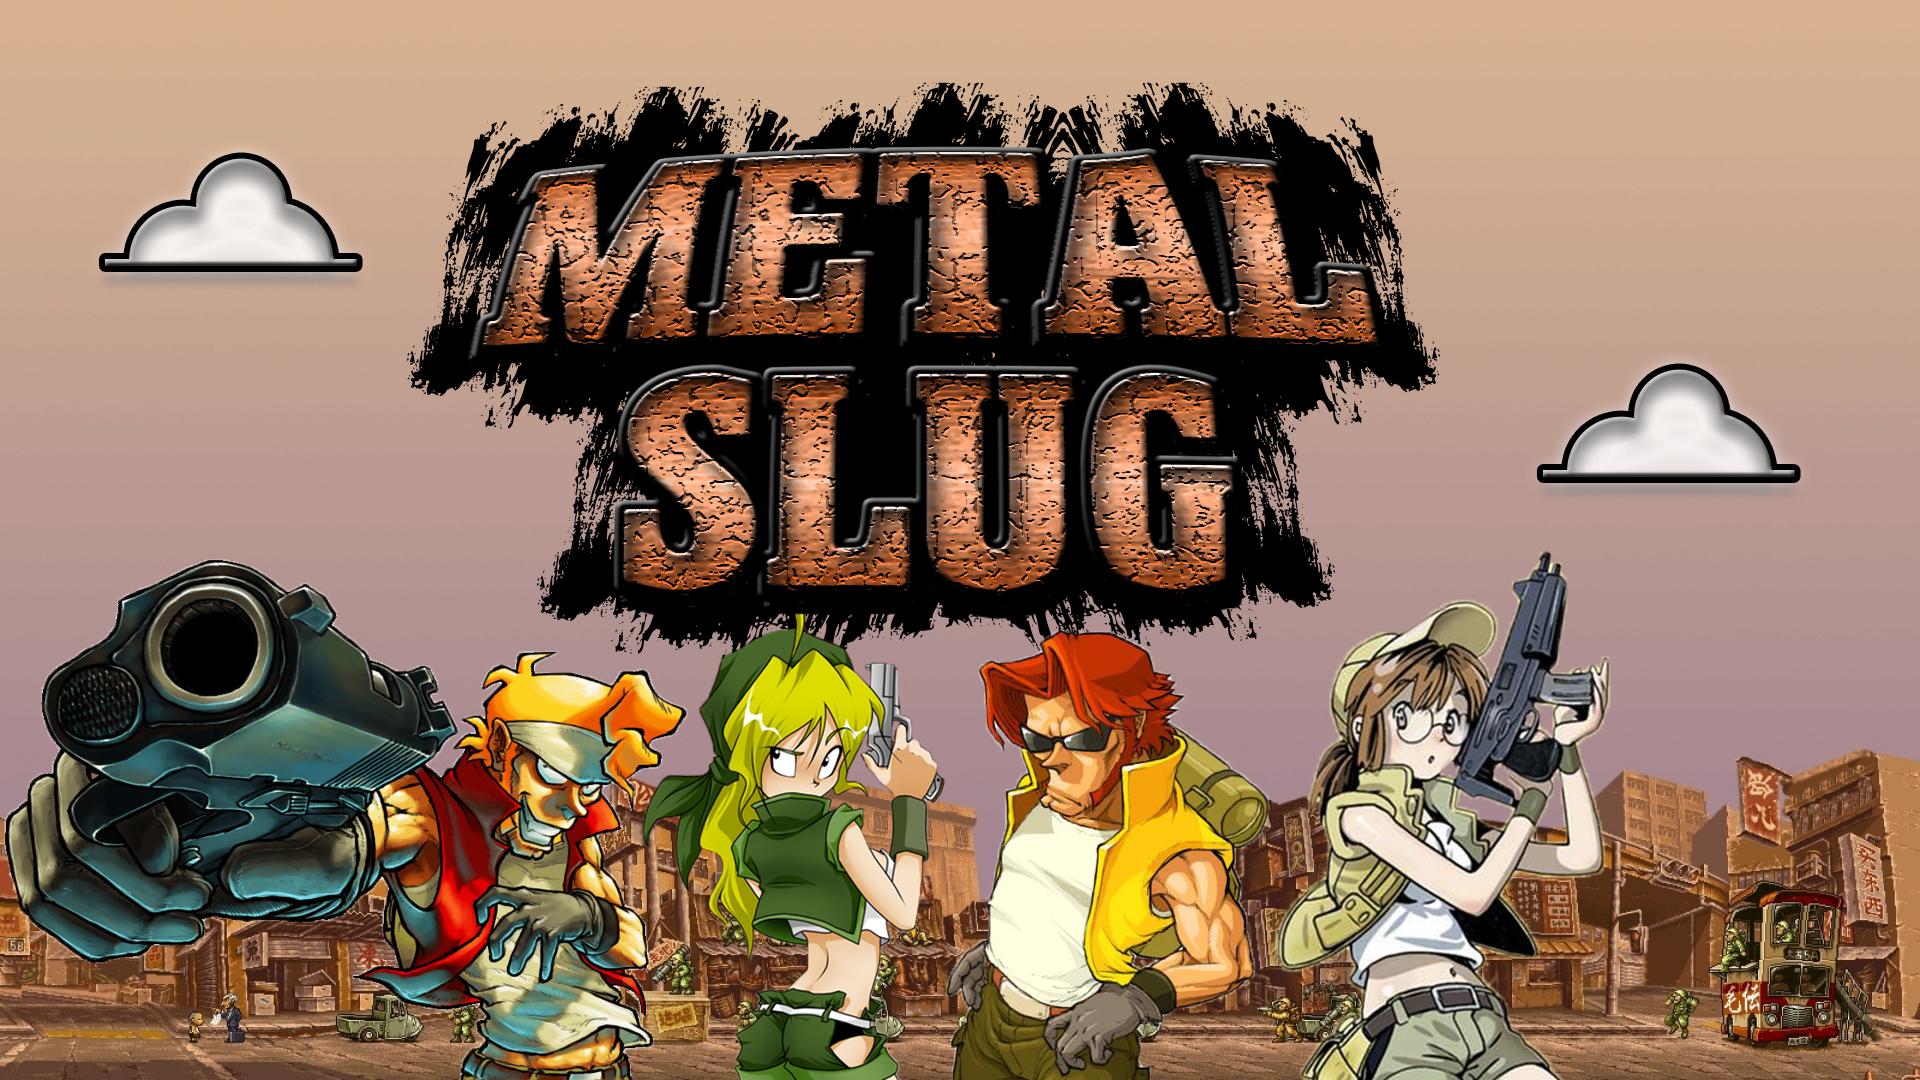 Metal Slug Wallpaper By Tonyzex1995 On Deviantart